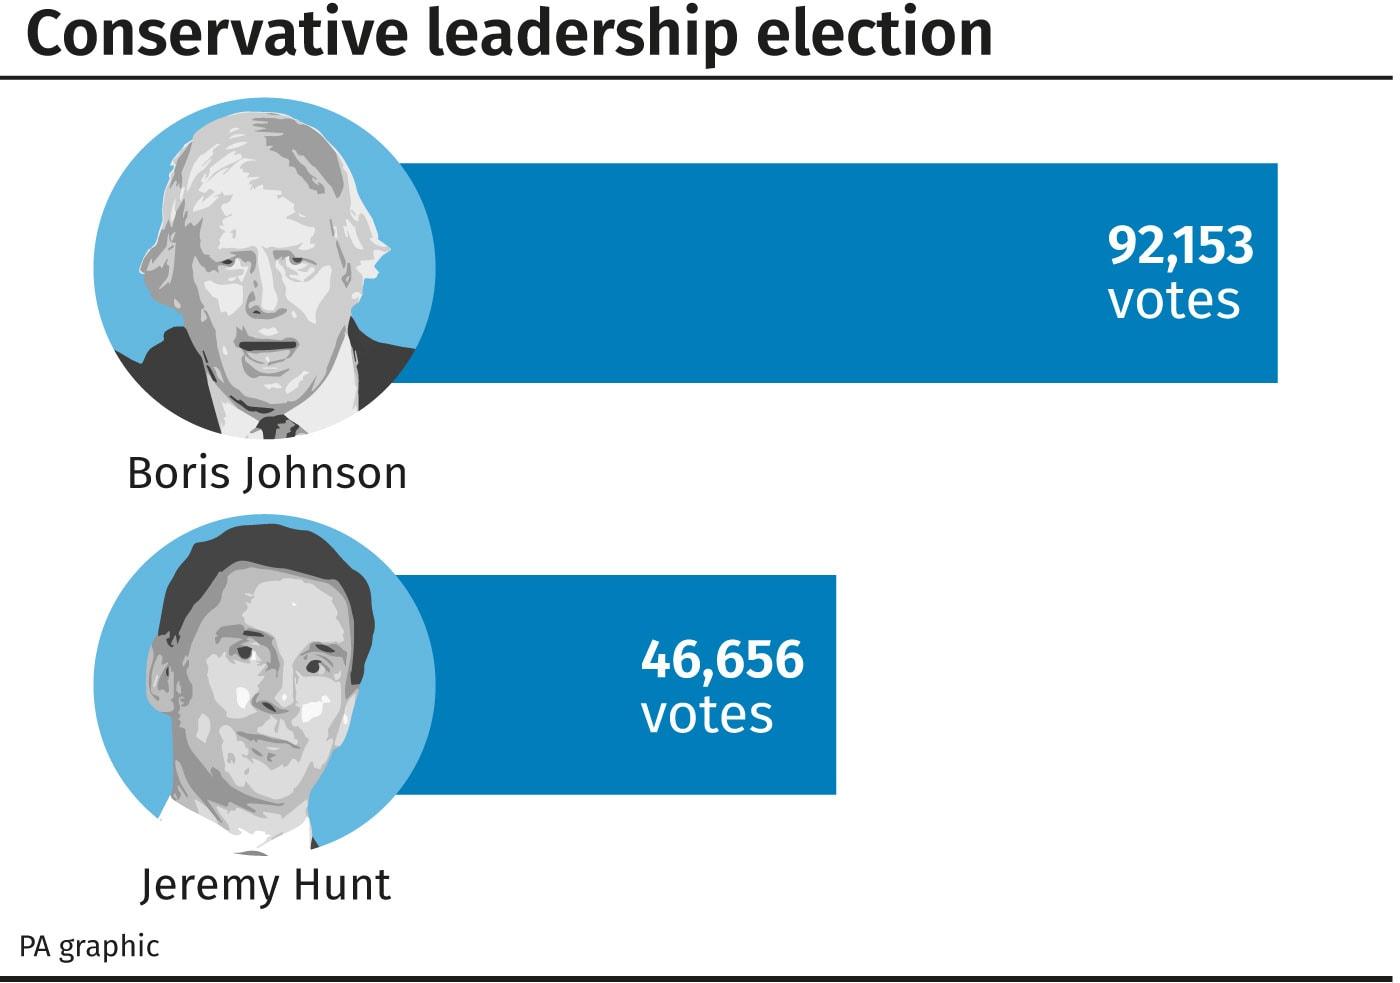 Boris Johnson v Hunt graphic